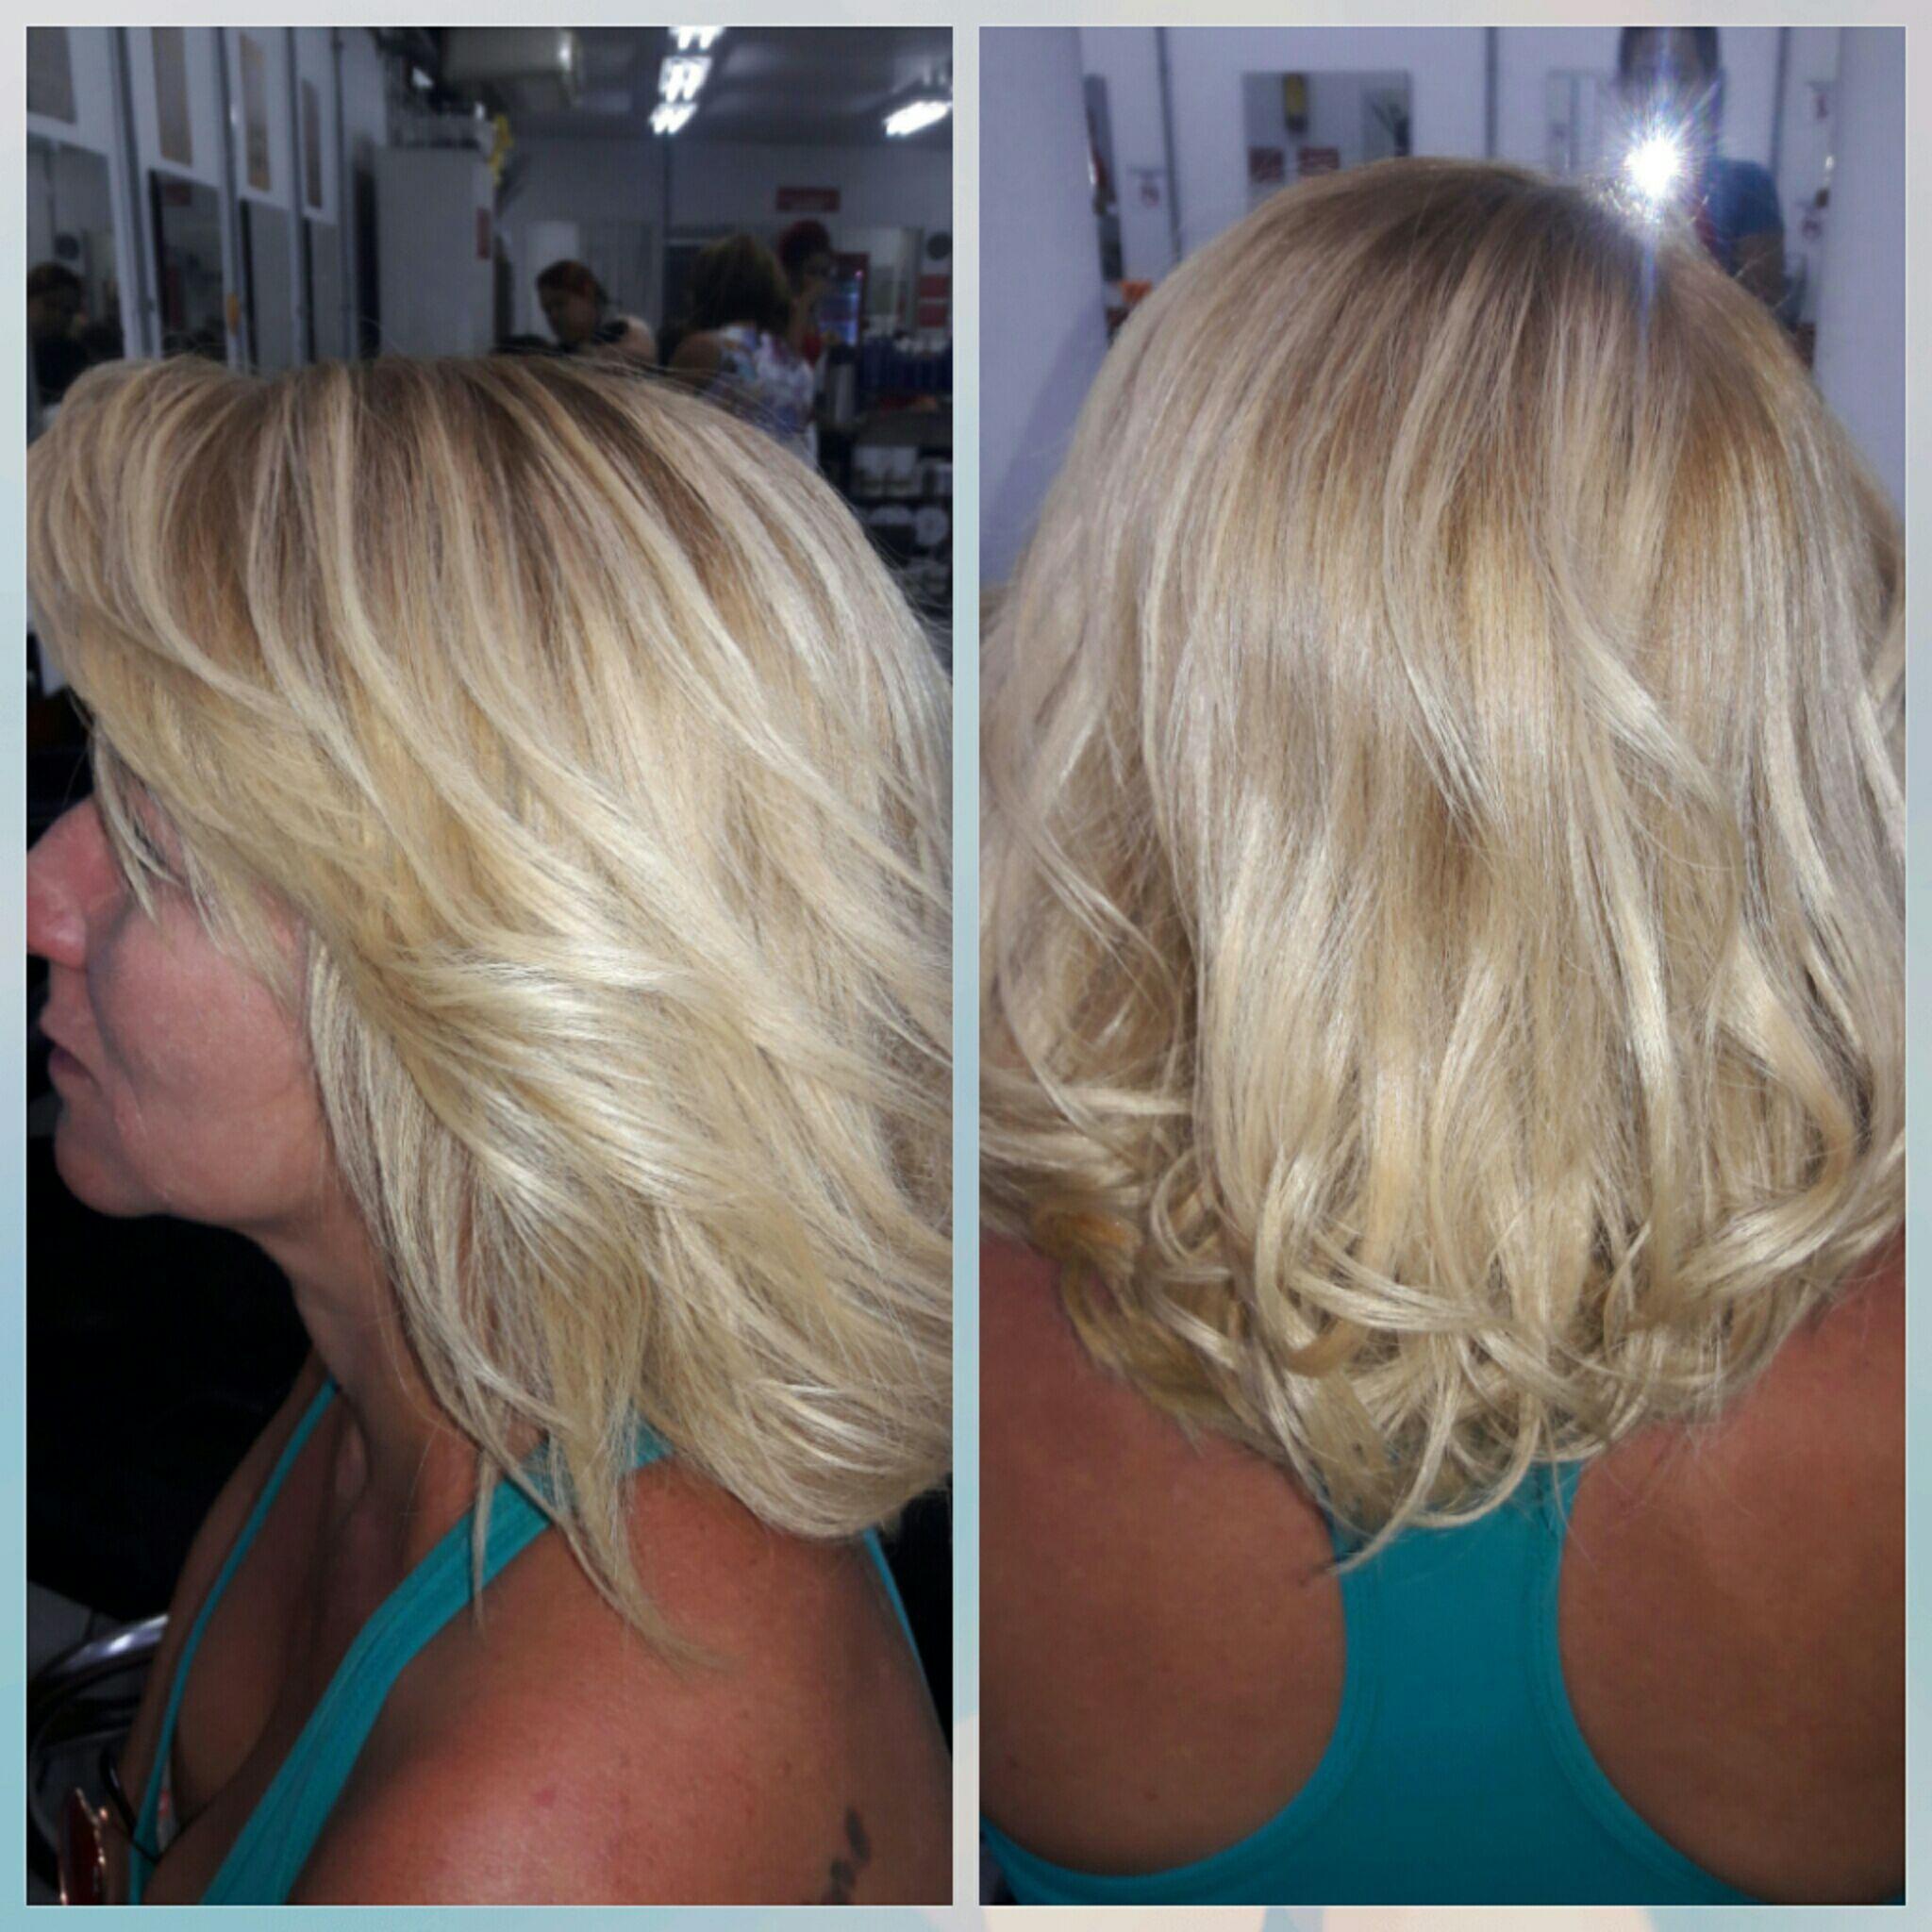 cabelo auxiliar cabeleireiro(a) auxiliar cabeleireiro(a) auxiliar cabeleireiro(a) estudante (cabeleireiro) estudante (cabeleireiro) estudante (cabeleireiro) estudante (cabeleireiro) auxiliar cabeleireiro(a)